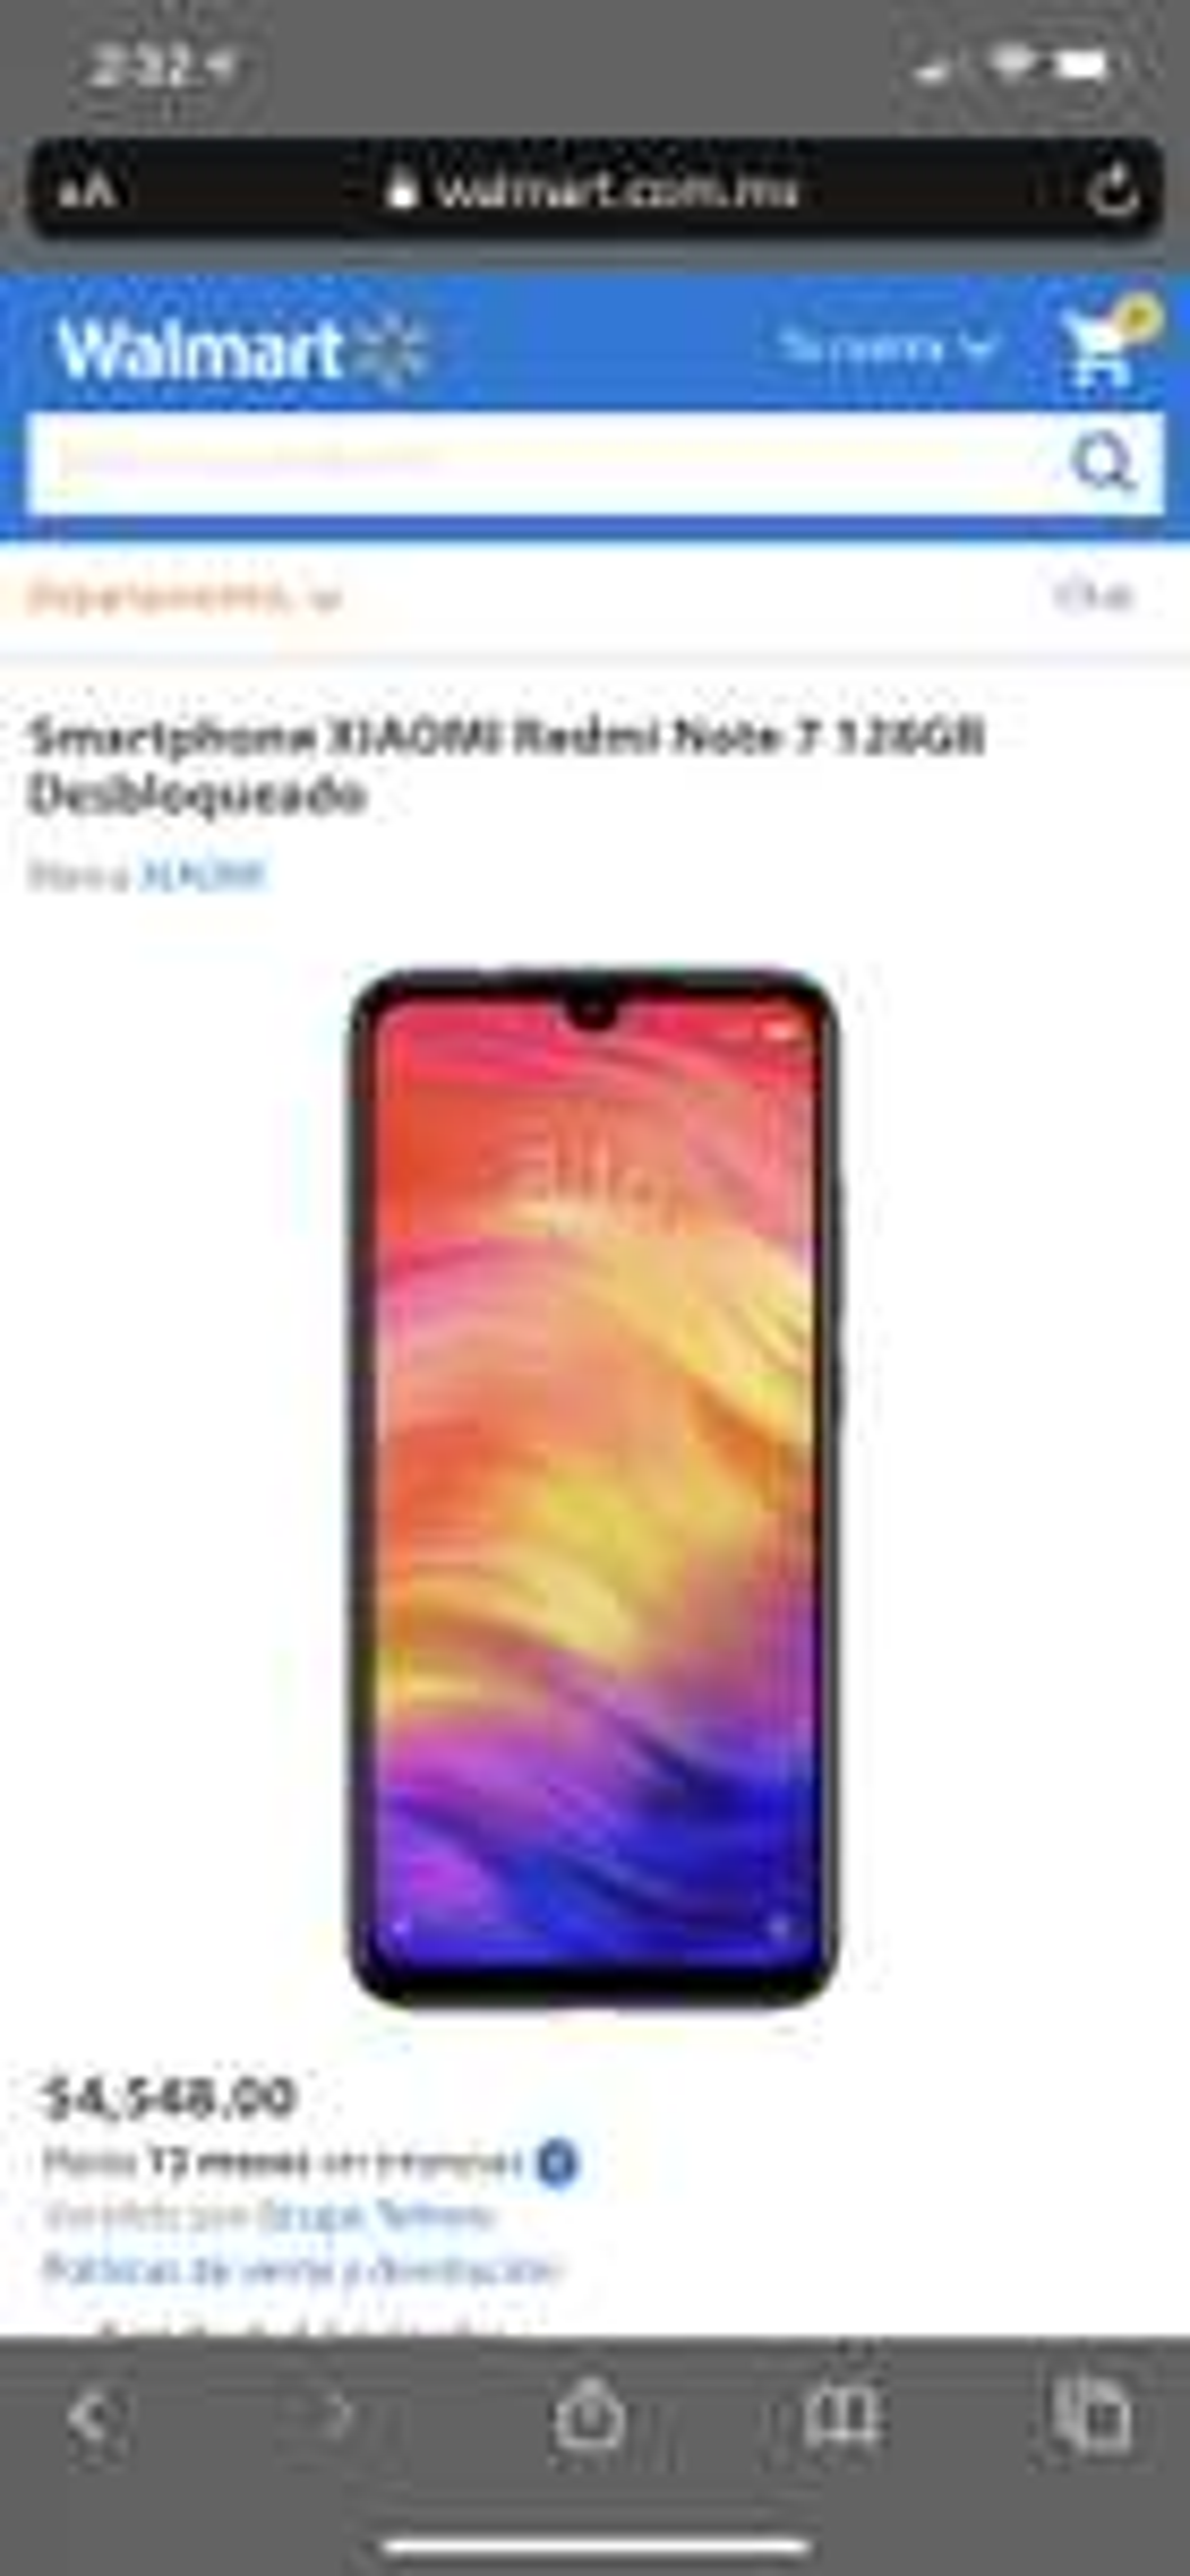 Walmart Xiaomi redmi note 8 128/4